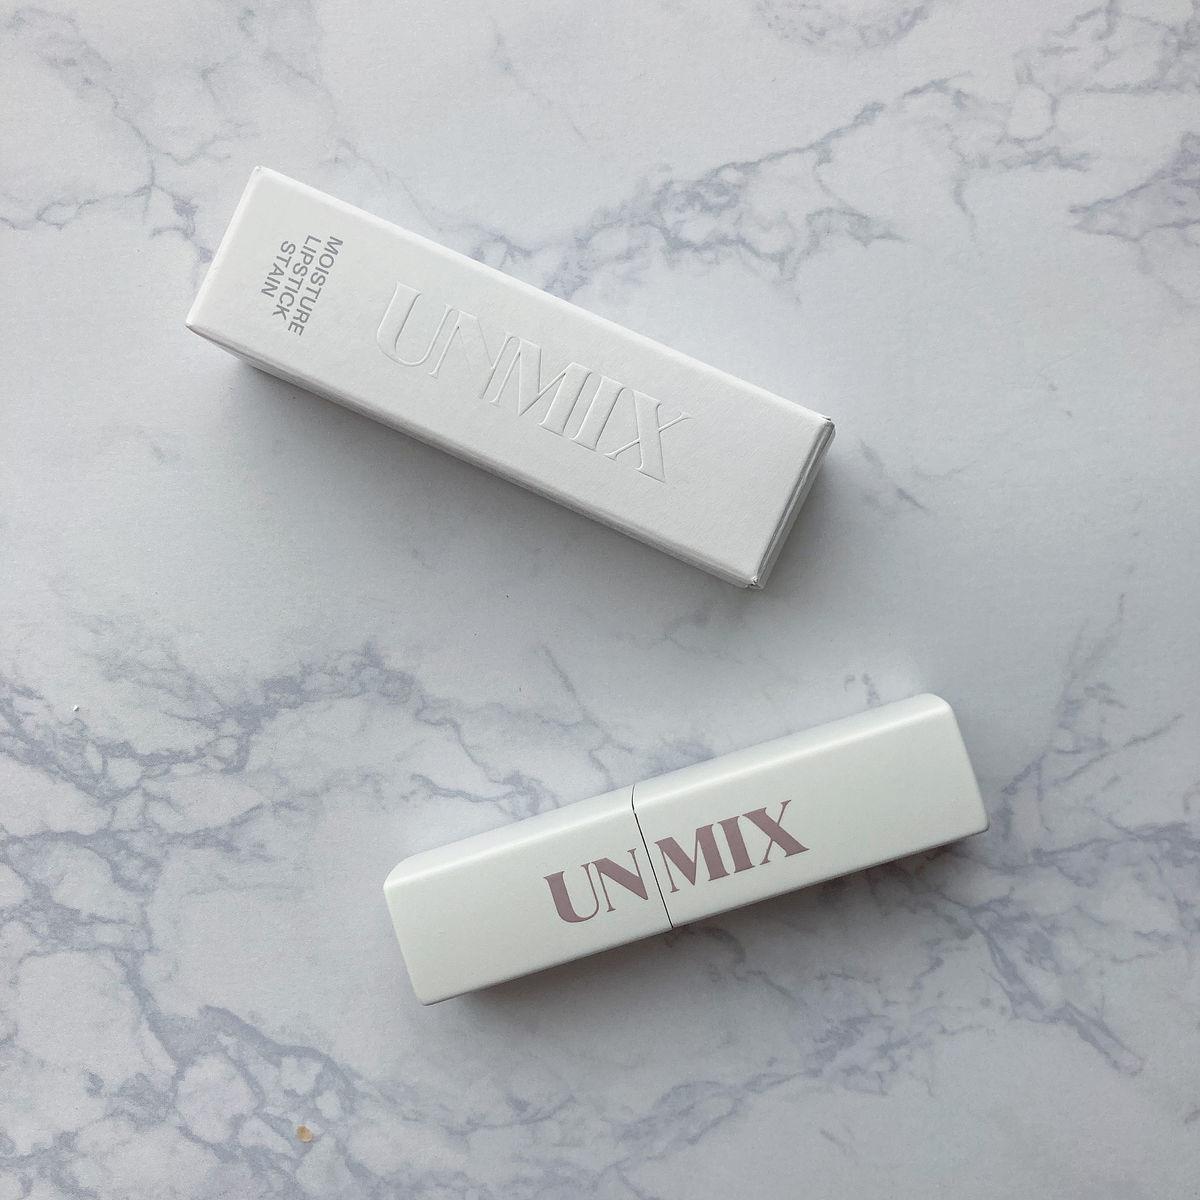 UNMIX リップ ステイン